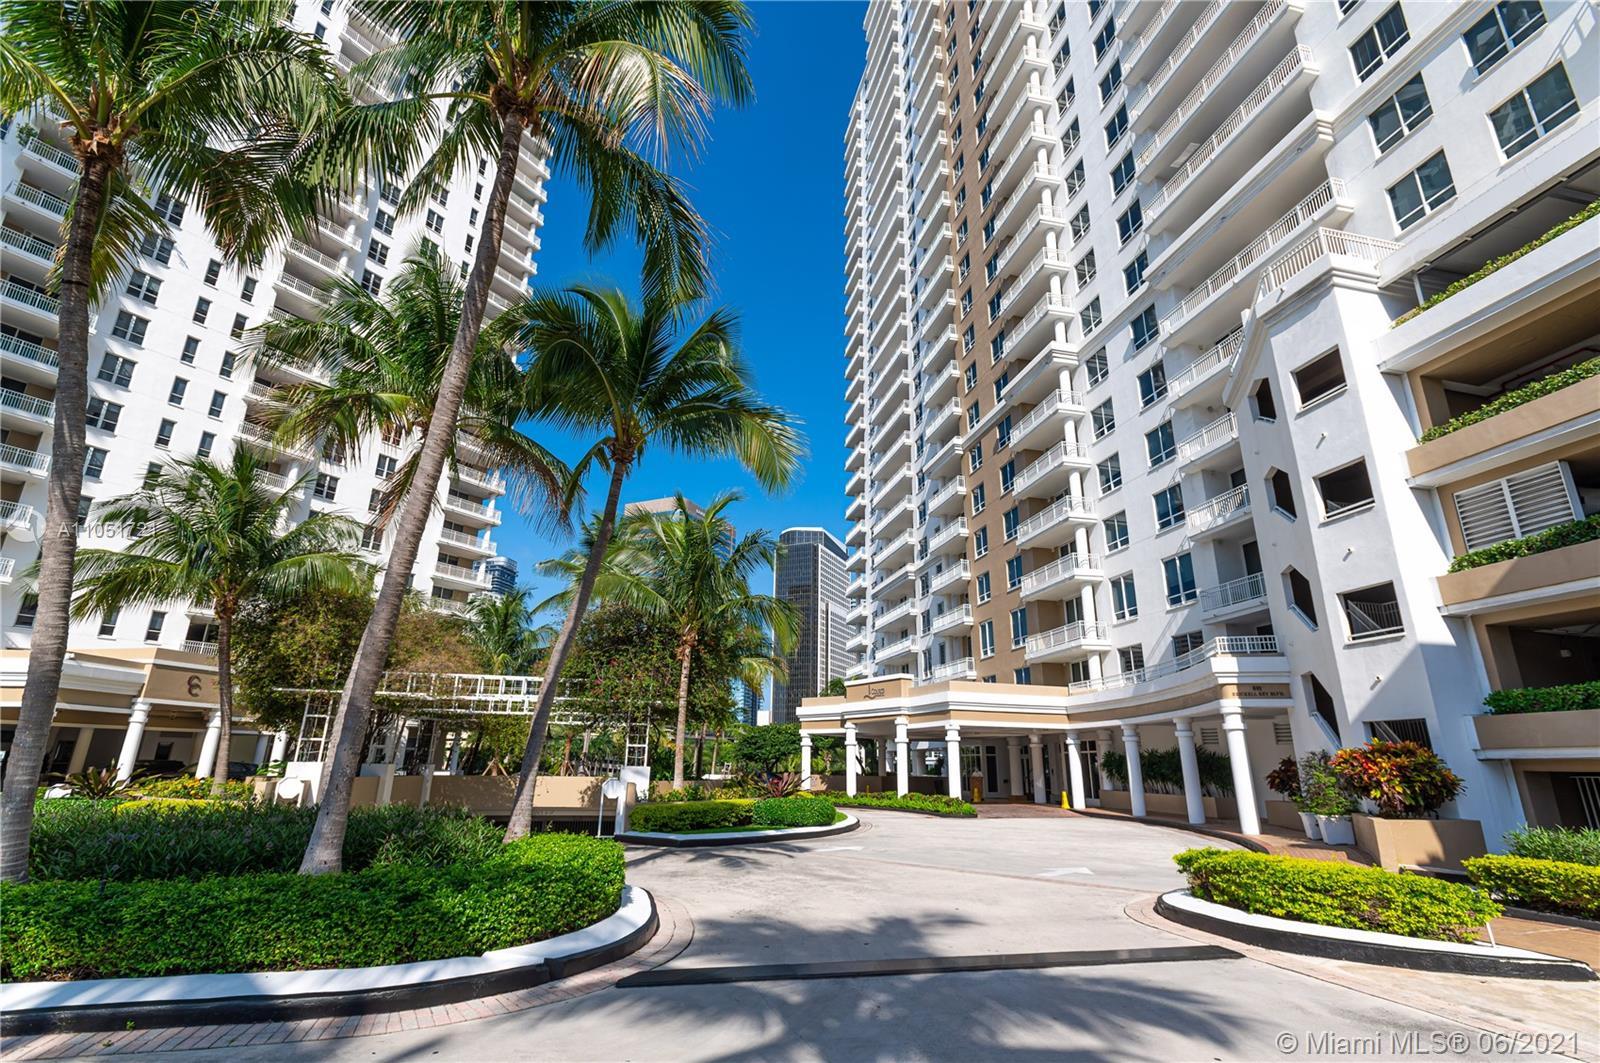 Courts Brickell Key #1805 - 801 Brickell Key Blvd #1805, Miami, FL 33131